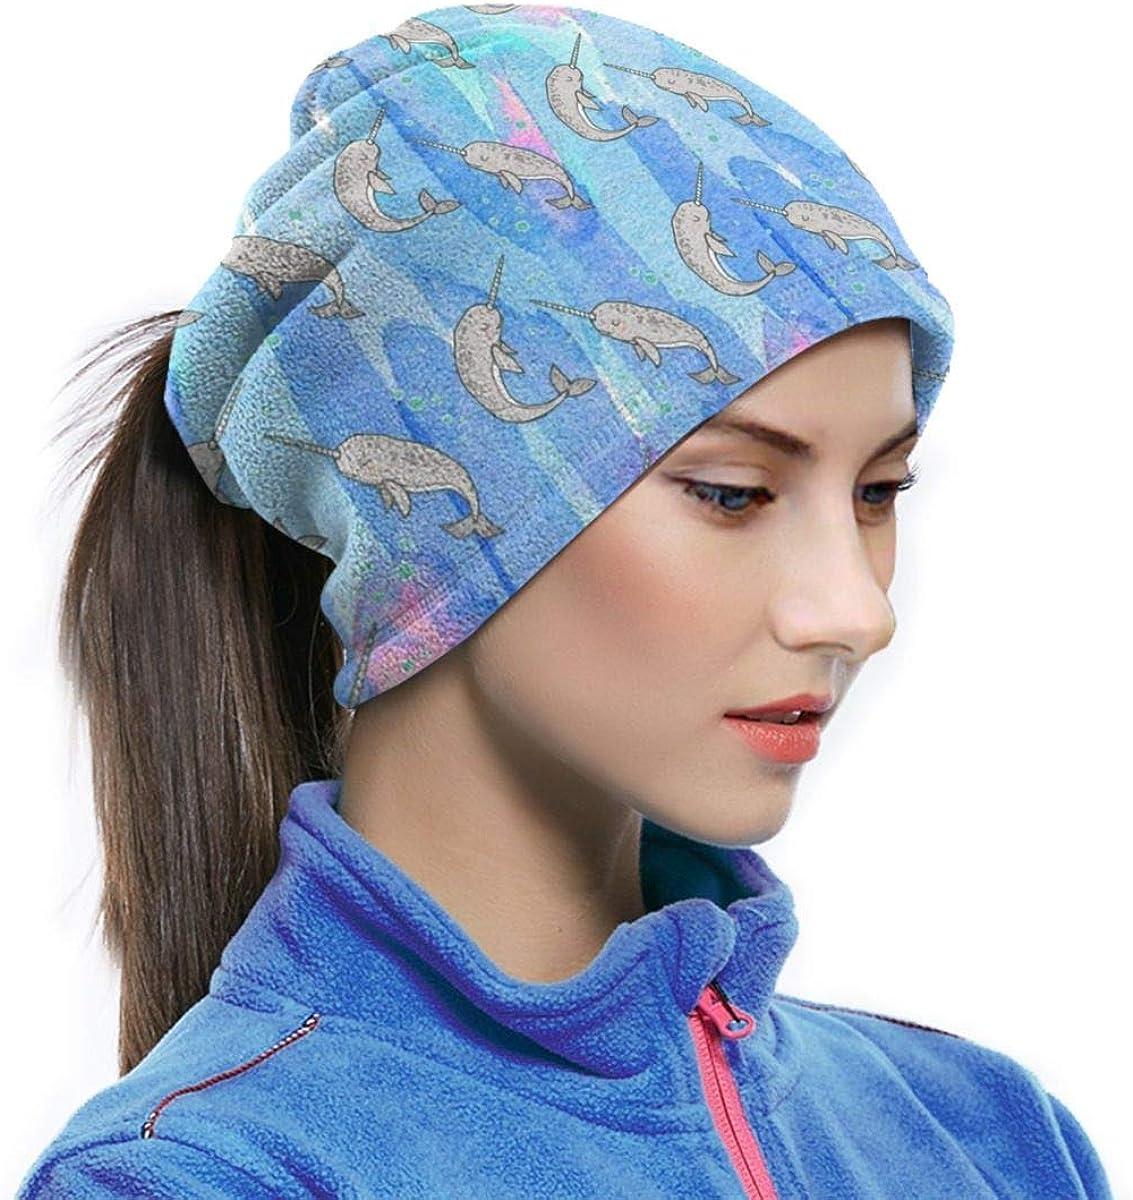 Microfiber Neck Warmer Narwhal Grey Sleep Neck Gaiter Tube Ear Warmer Headband Scarf Face Mask Balaclava